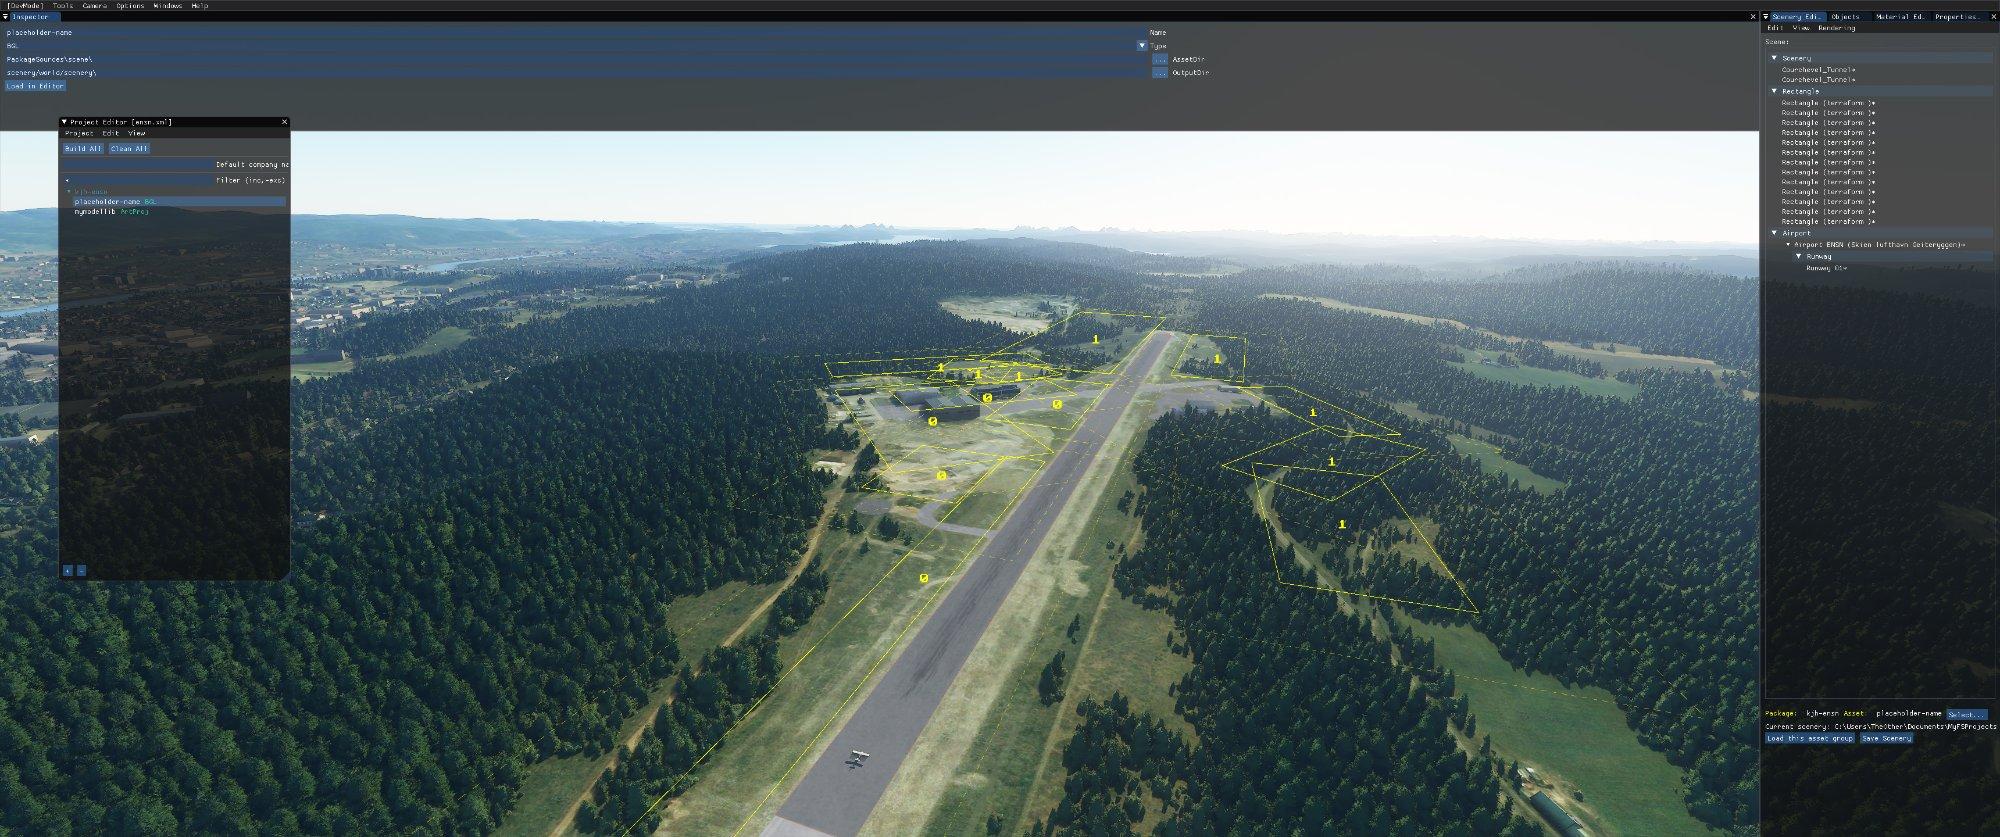 Microsoft Flight Simulator Screenshot 2020.10.26 - 21.04.38.35.jpg